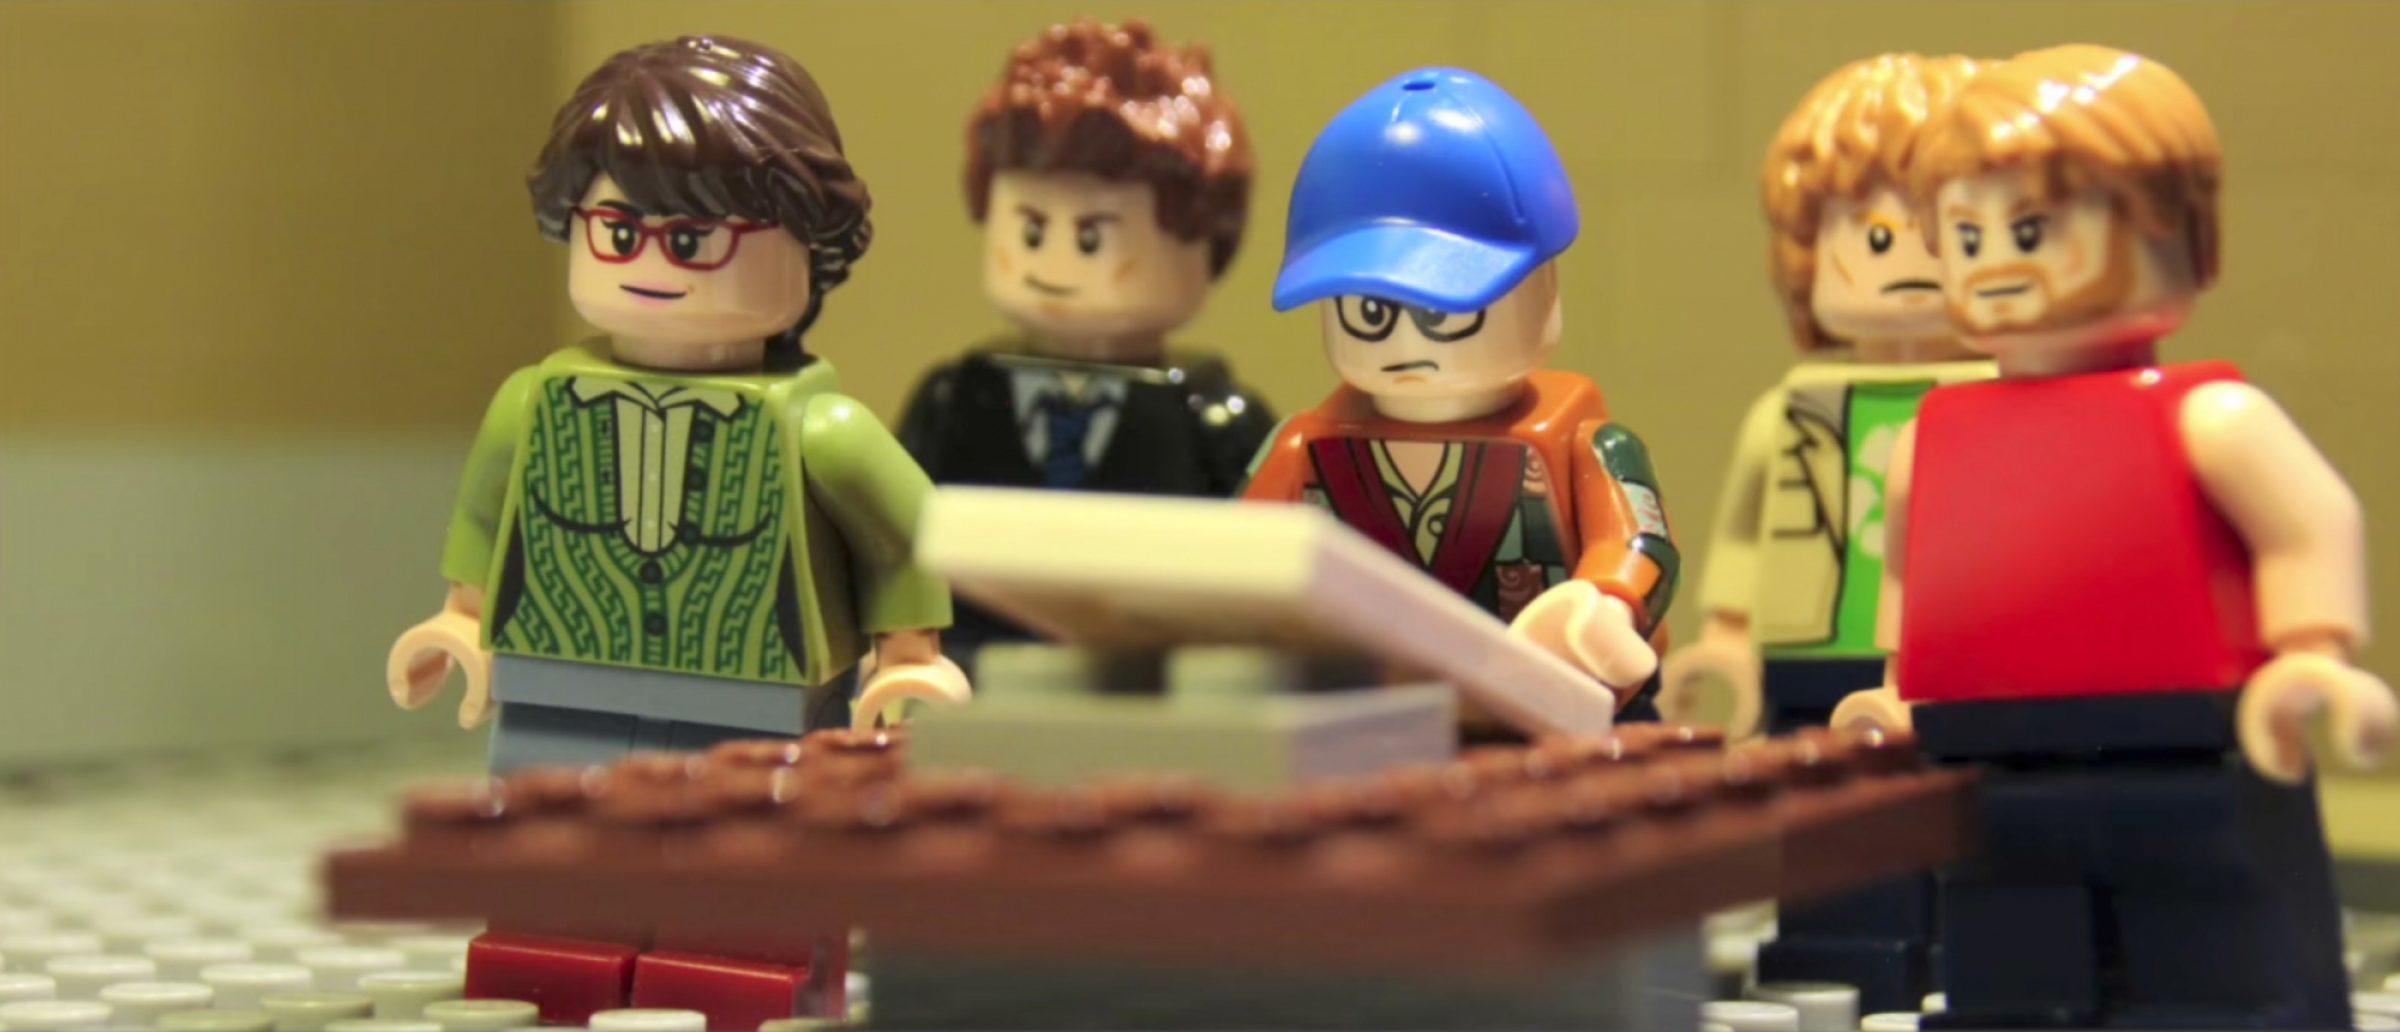 Disasterpiece Lego Thumb Optimized